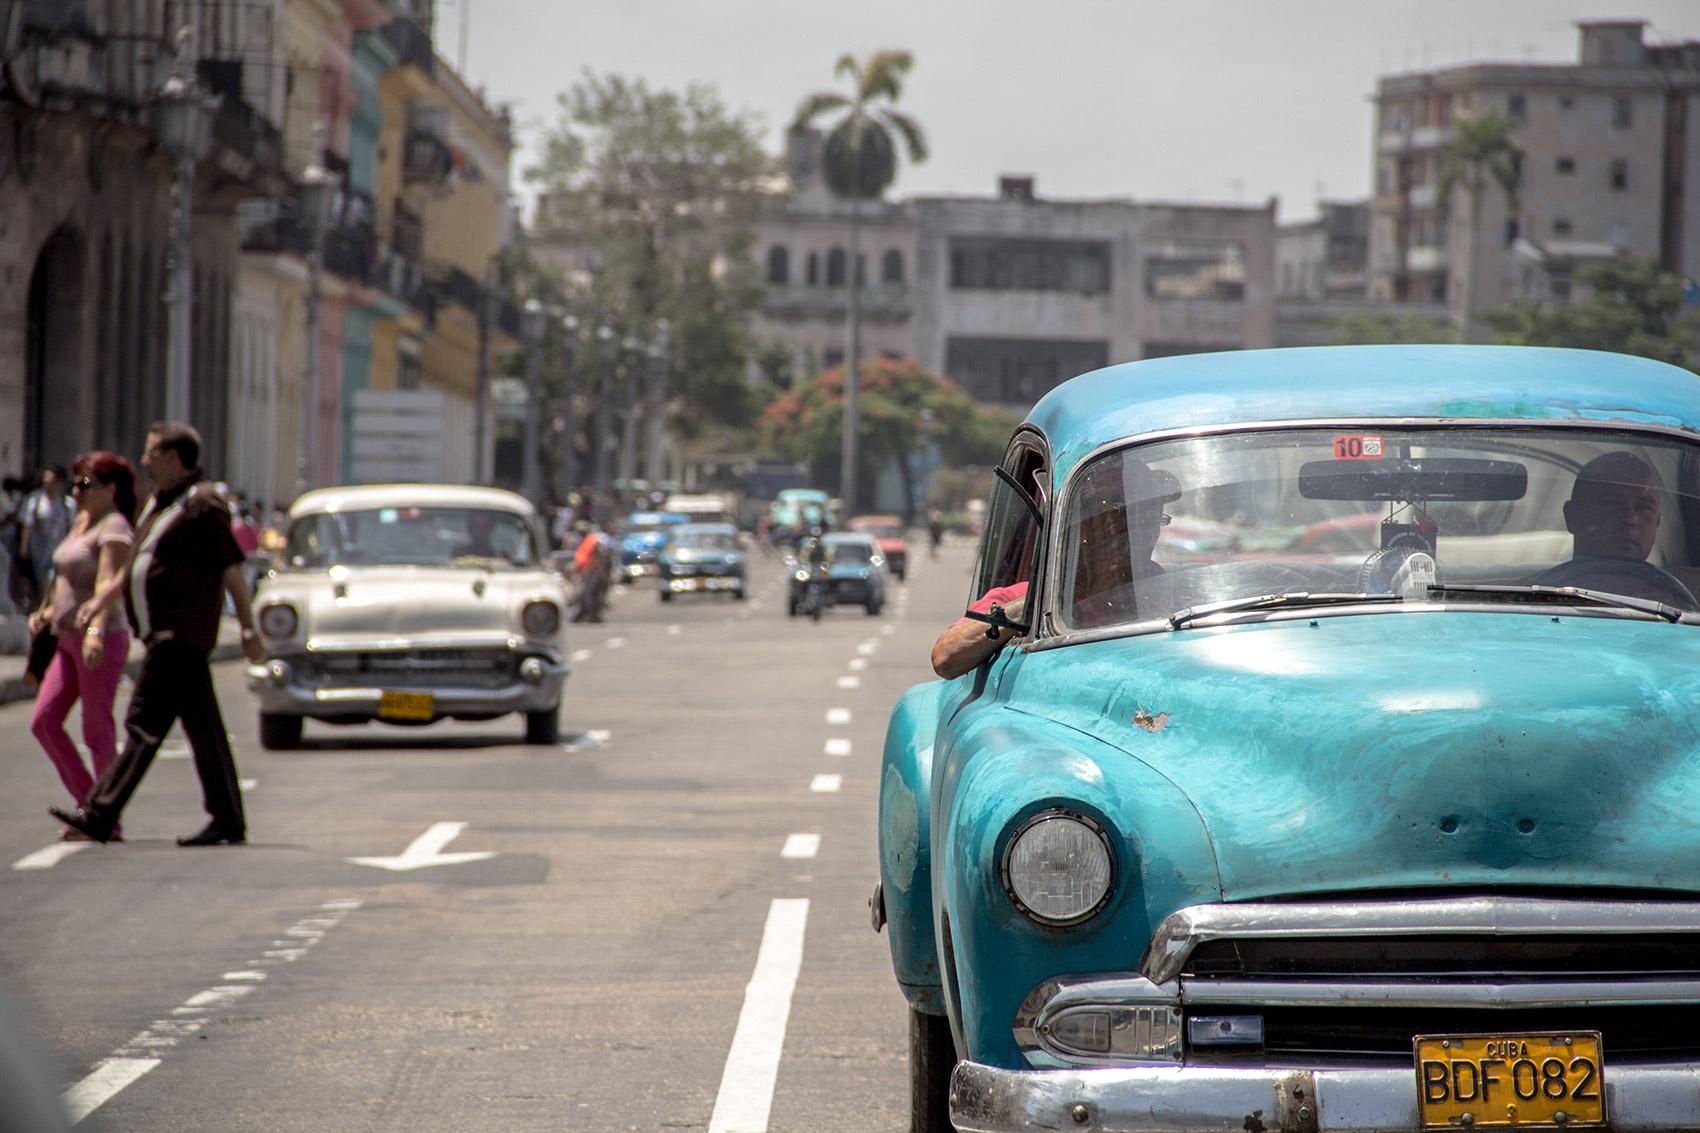 Typical pastel color 50s car in Havana